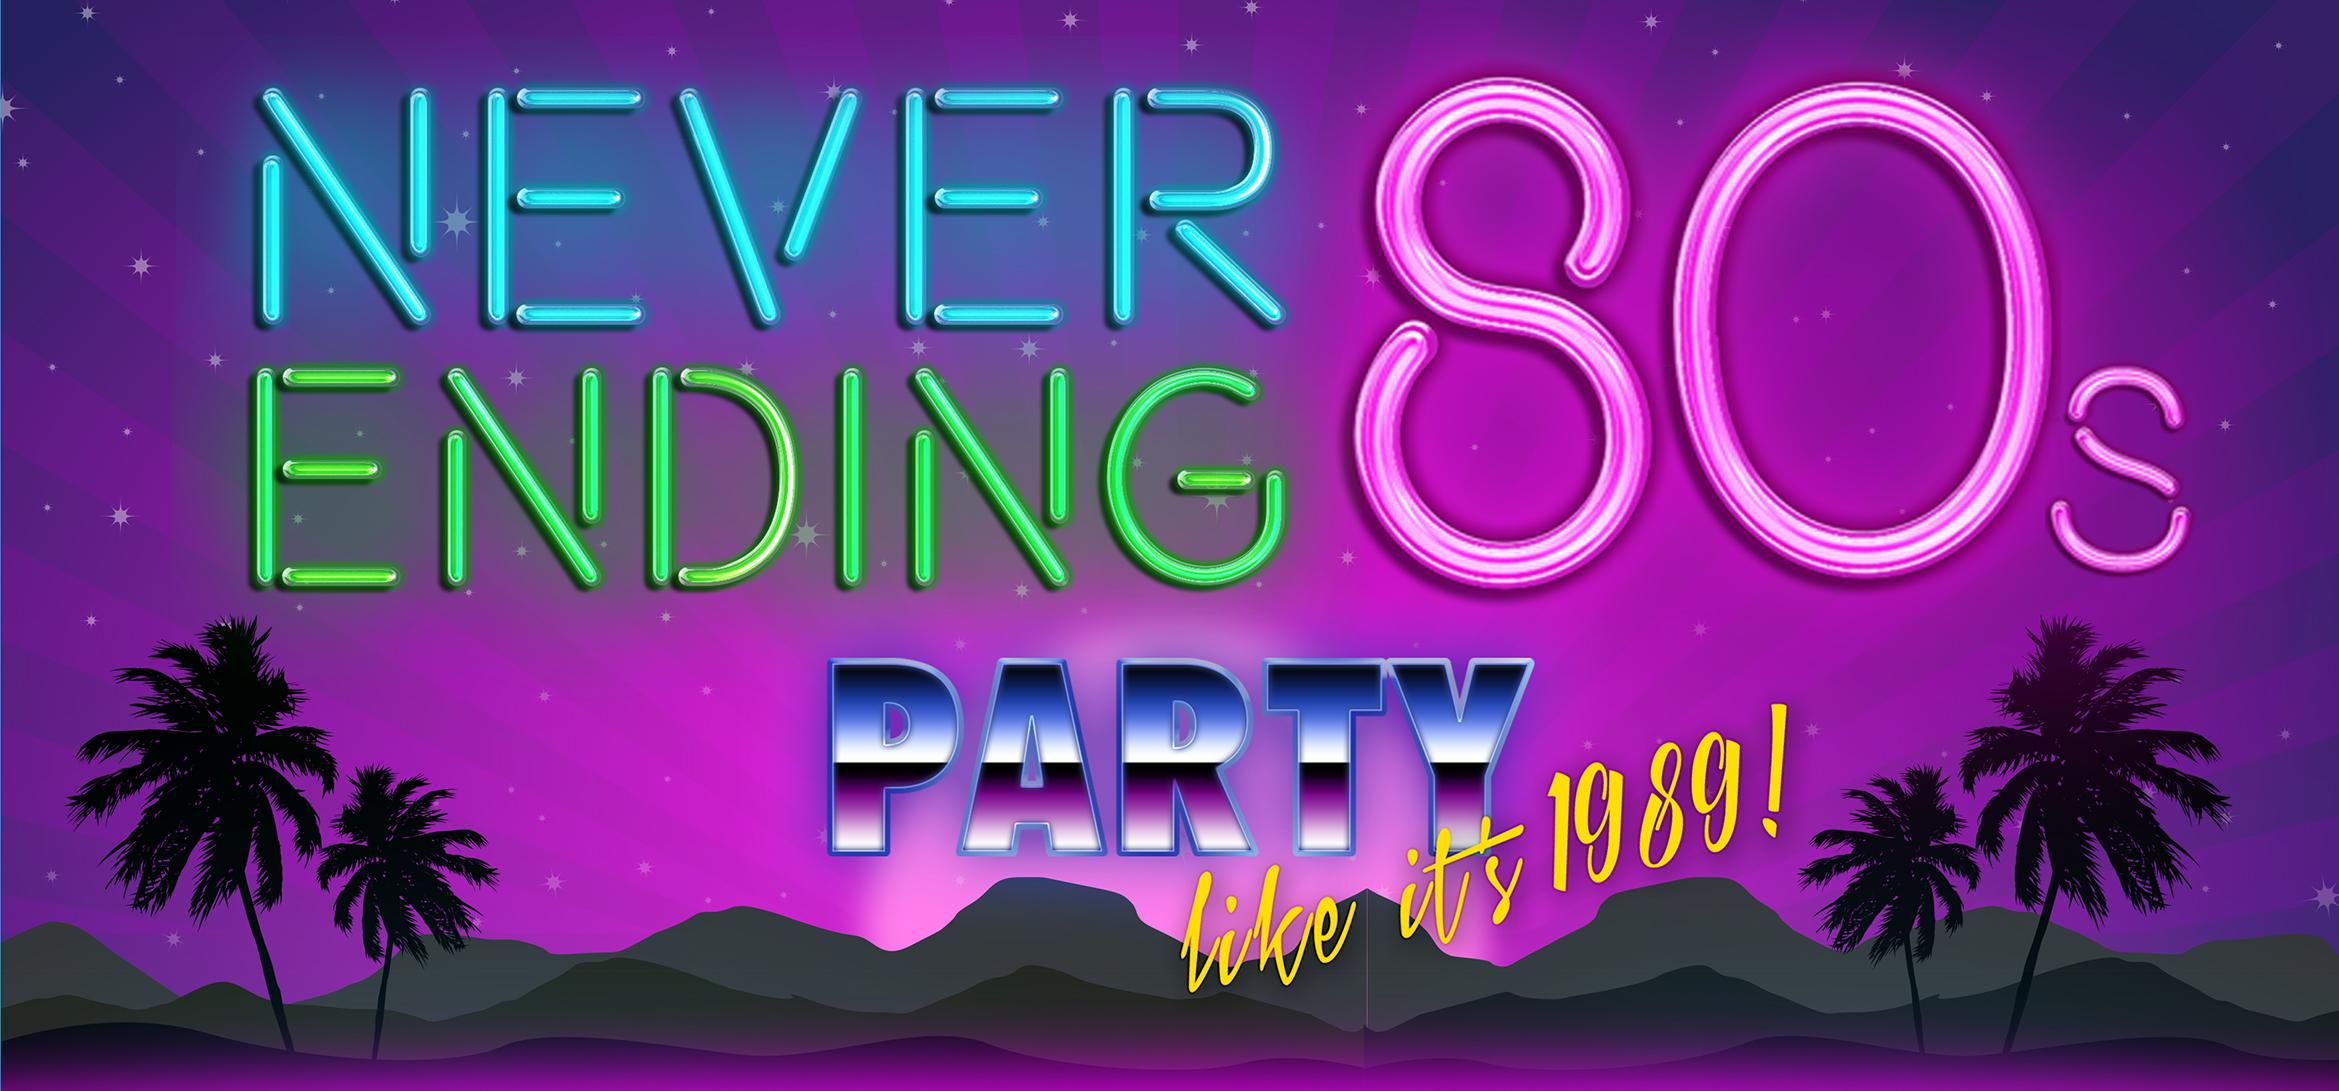 NE80s Party Like It's 1989 Banner.jpg